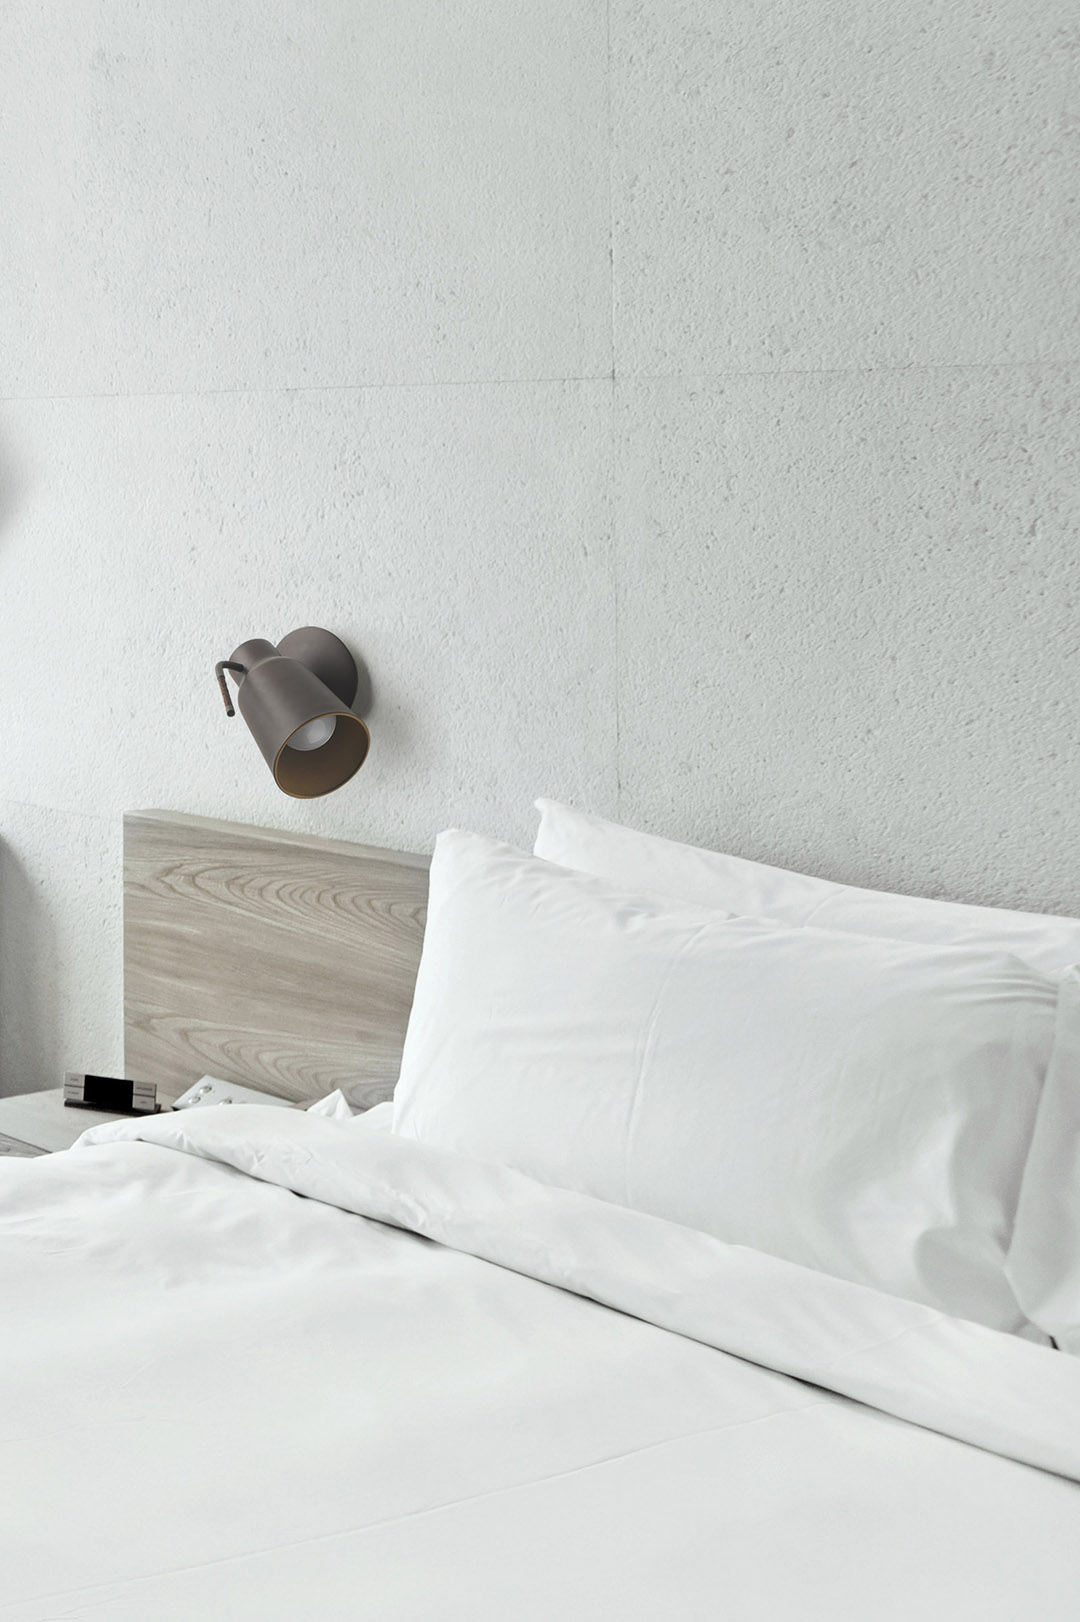 Full Size of Schlafzimmer Wandlampe Coole Metall Mit Schalter Leuchte Im Industrie Design Komplett Guenstig Günstig Komplettes Wandtattoo Eckschrank Schrank Landhaus Schlafzimmer Schlafzimmer Wandlampe